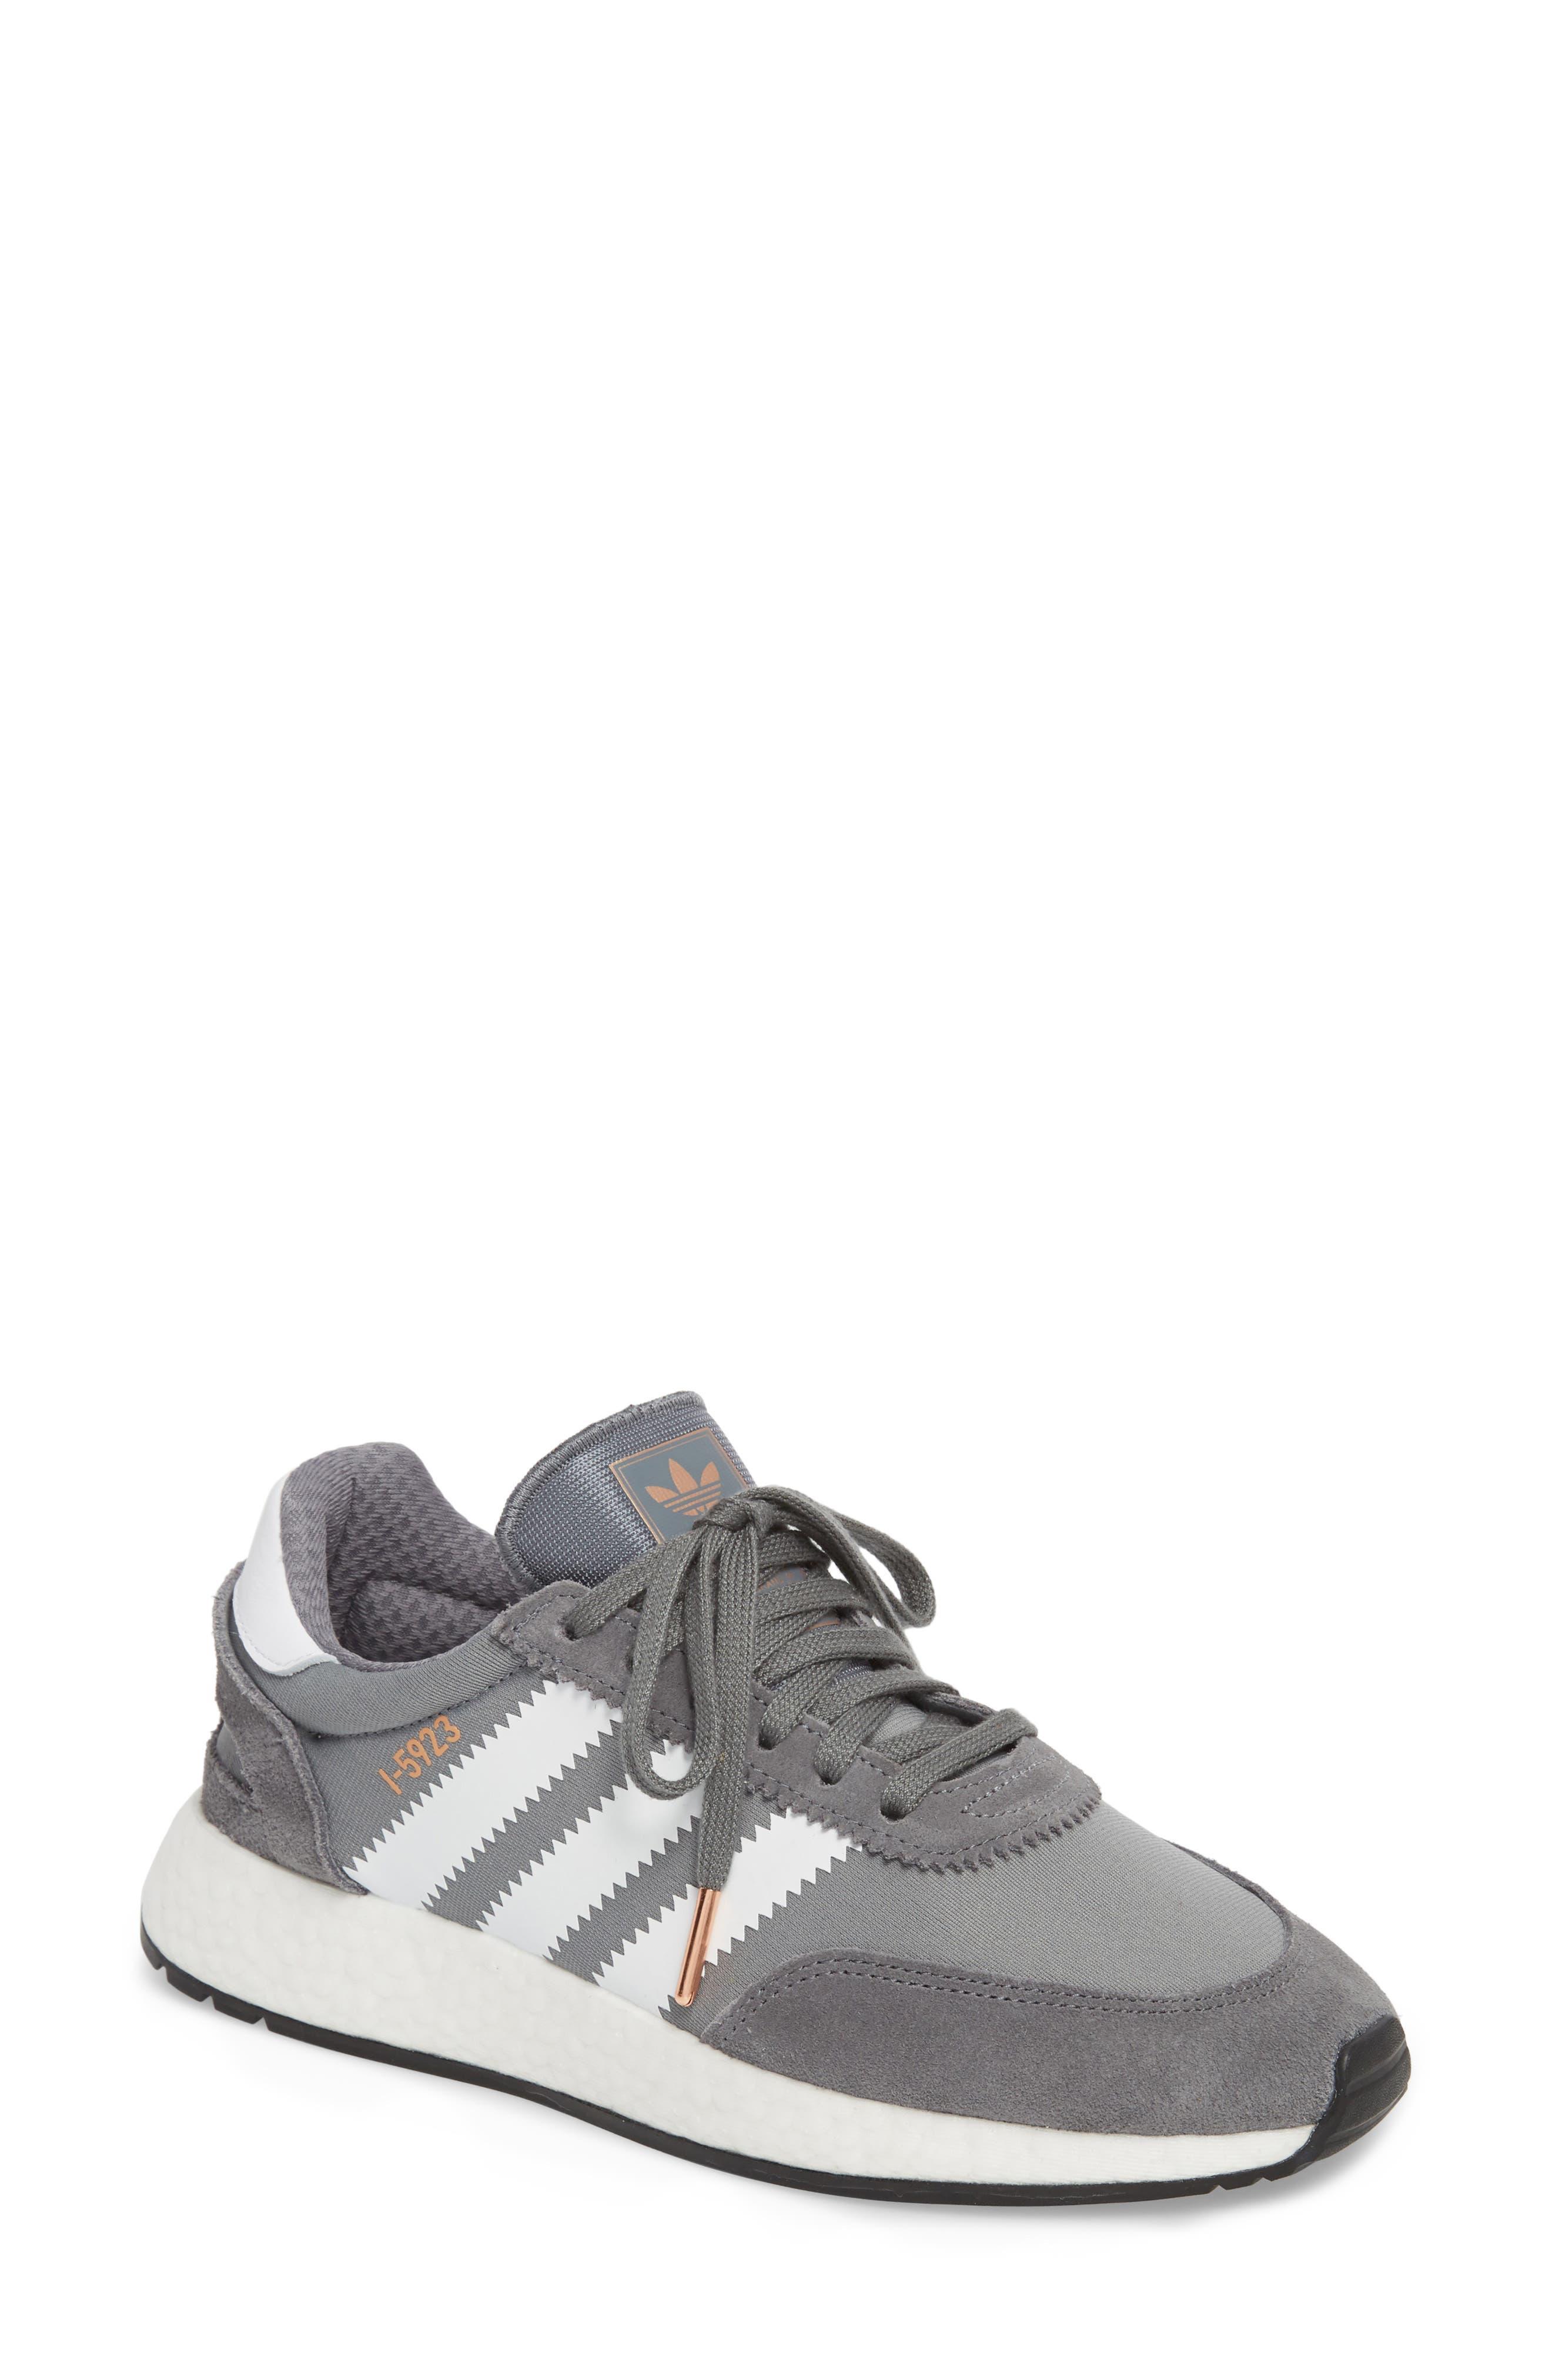 I-5923 Sneaker,                             Main thumbnail 1, color,                             Visible Grey/ White/ Black